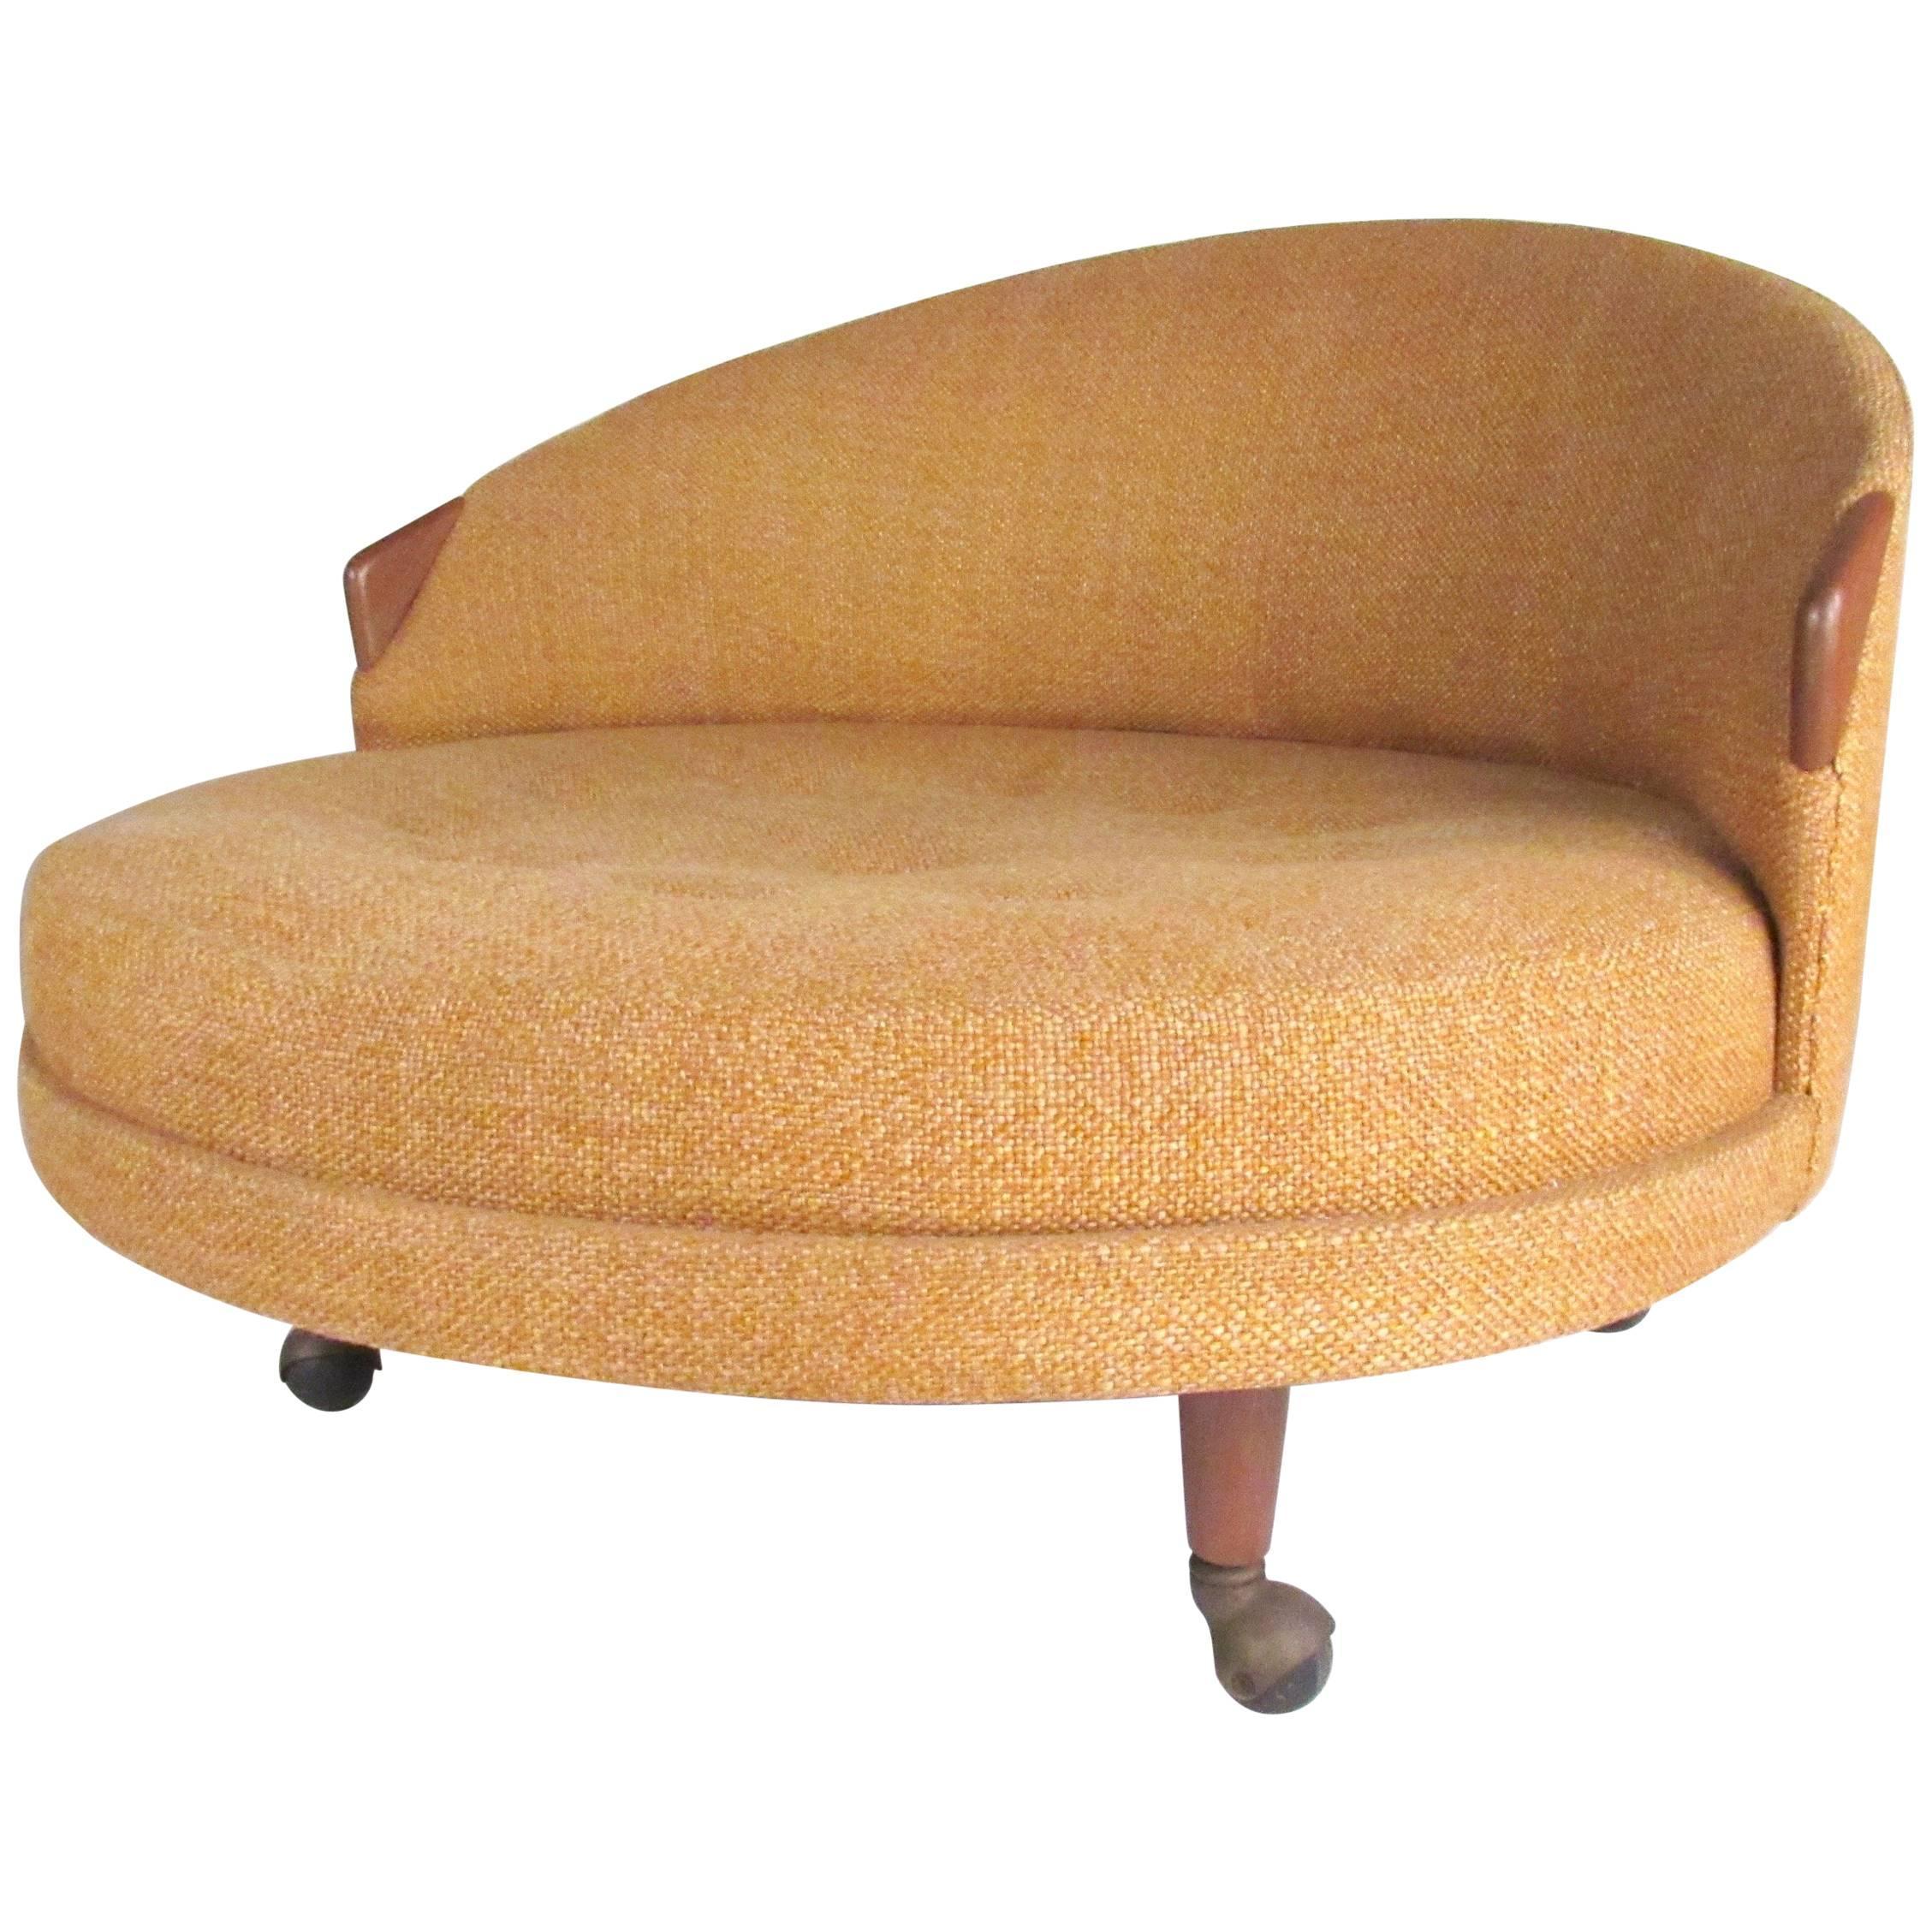 vintage modern adrian pearsall havana chair